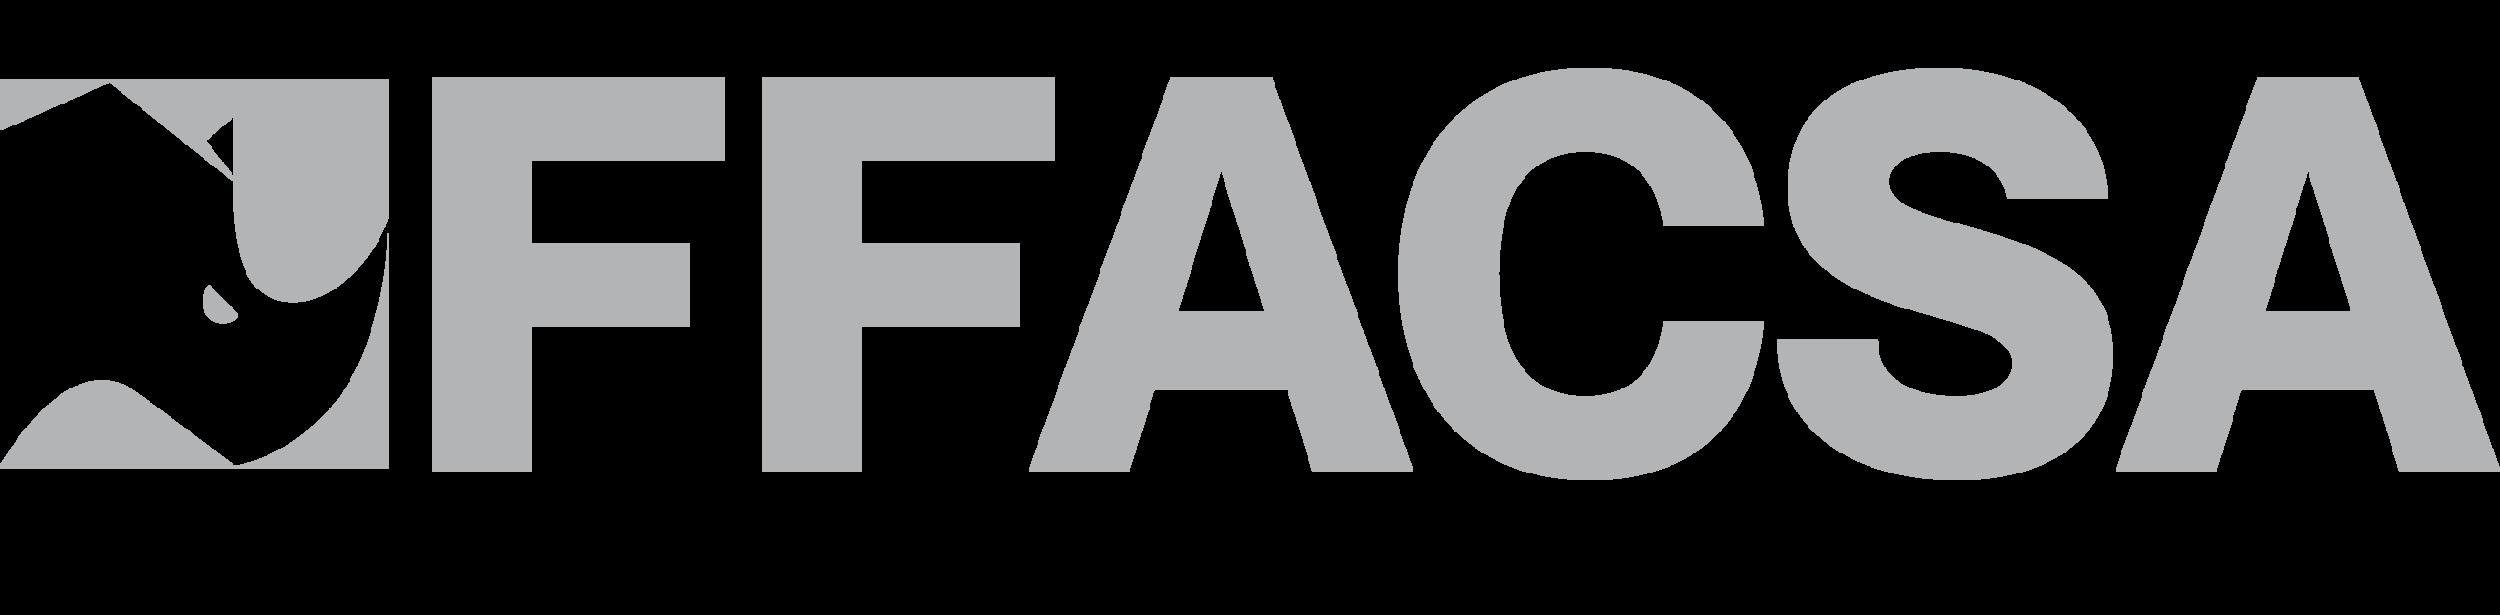 ffacsa logos.png